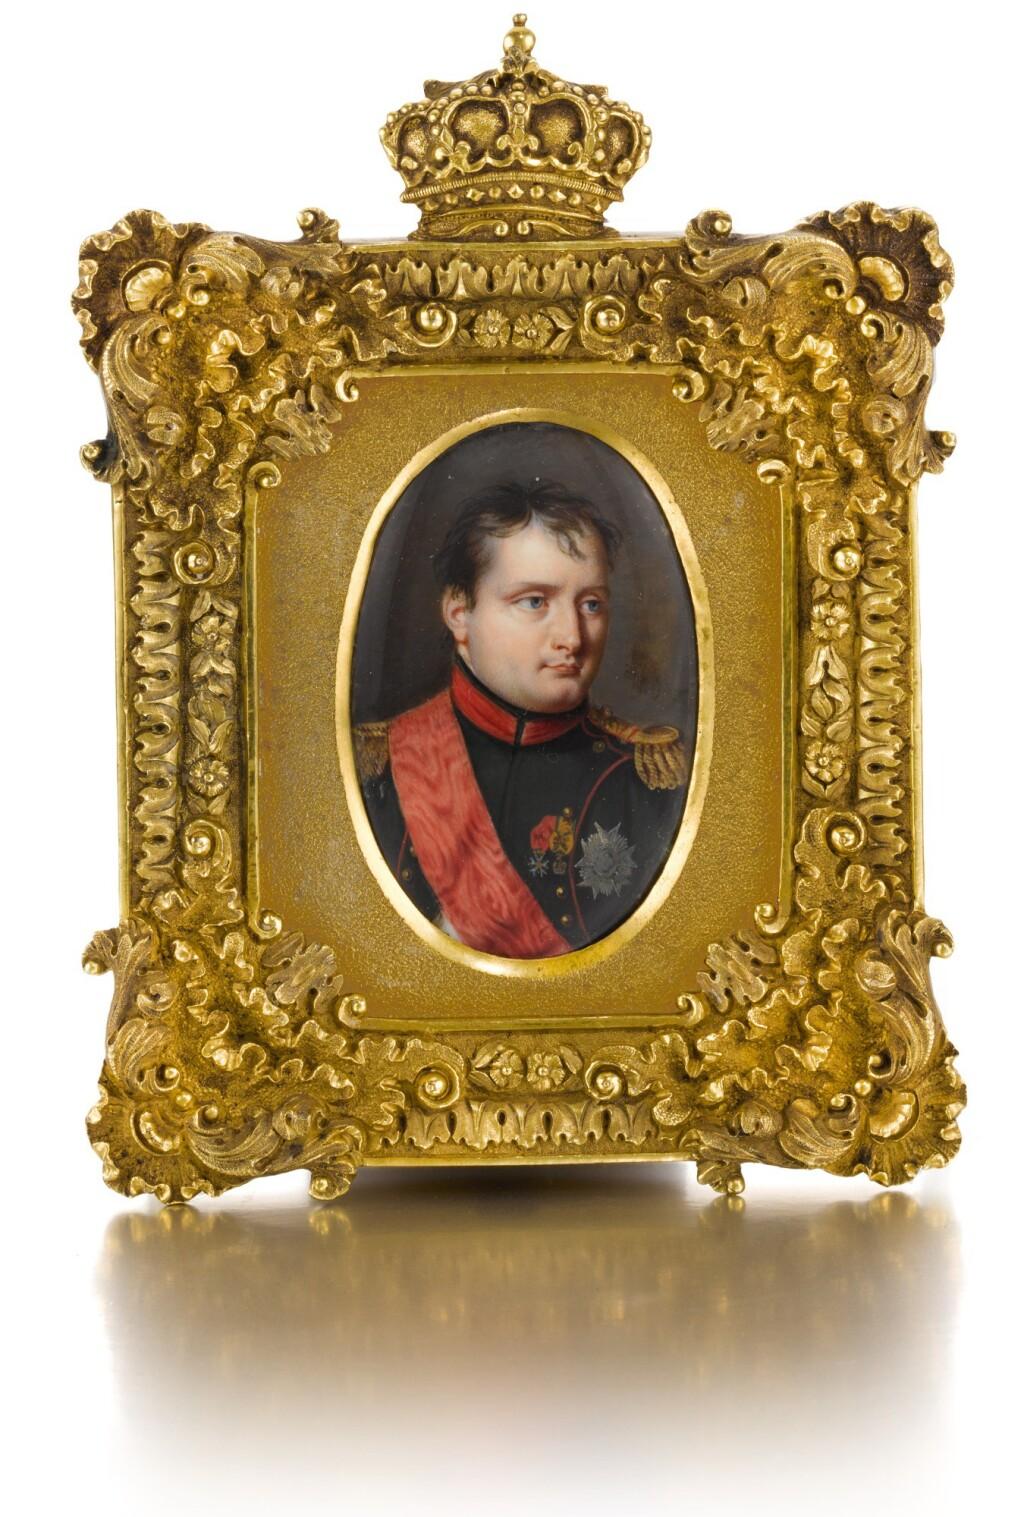 ATTRIBUTED TO AUBERT-HENRI-JOSEPH PARENT | PORTRAIT OF NAPOLEON I, EMPEROR OF THE FRENCH